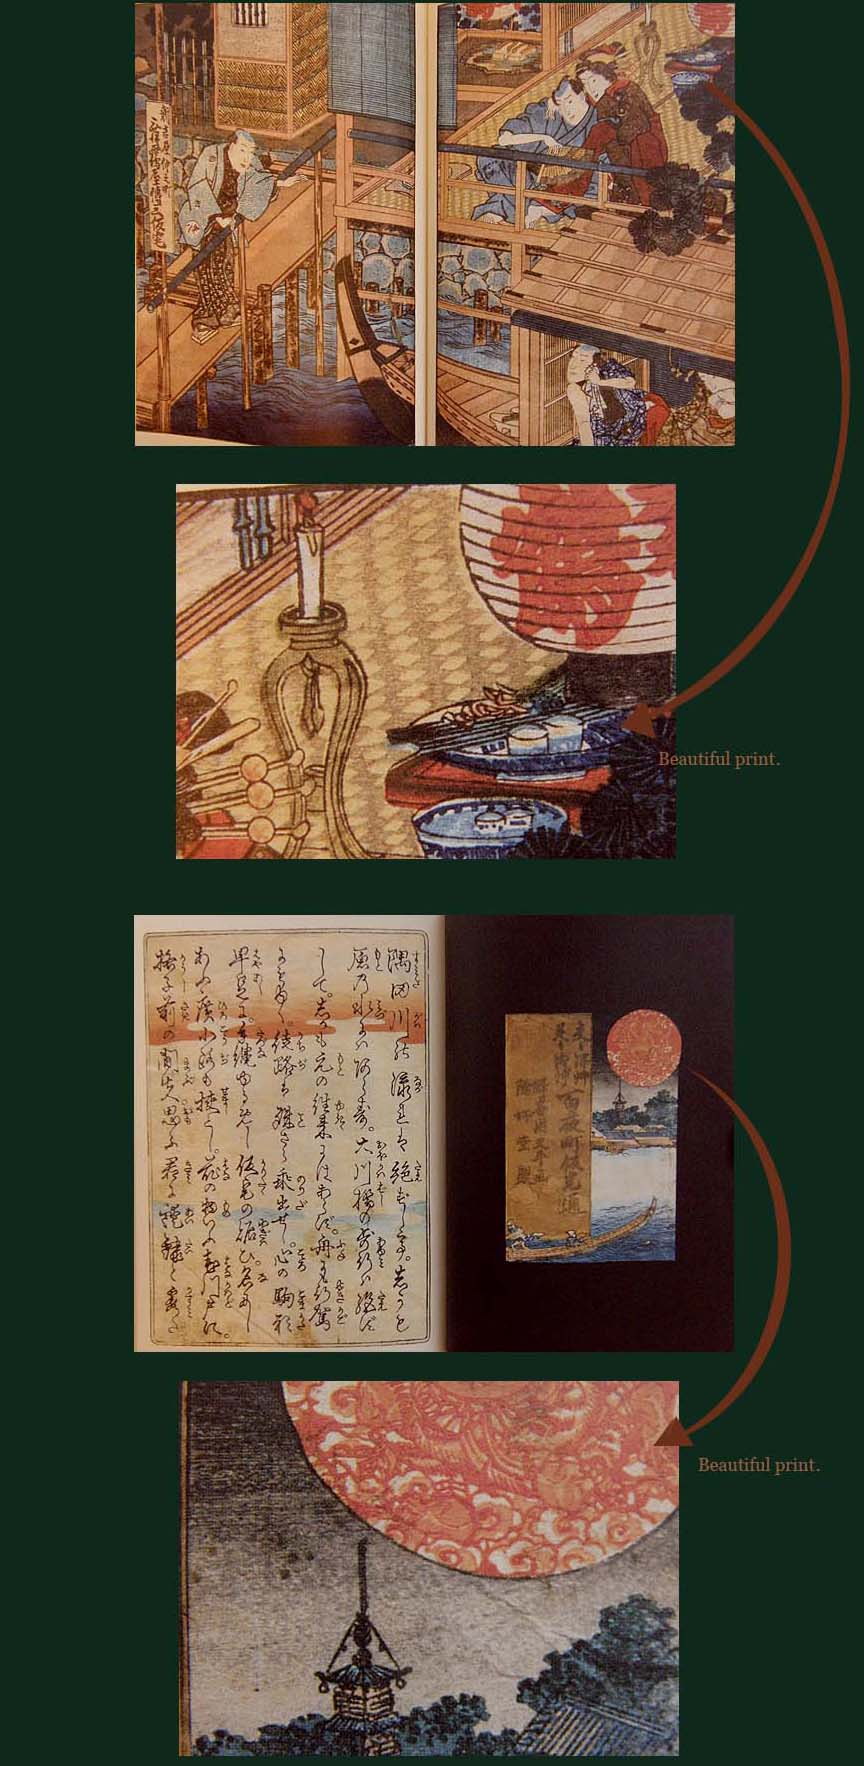 歌川国貞の画像 p1_17